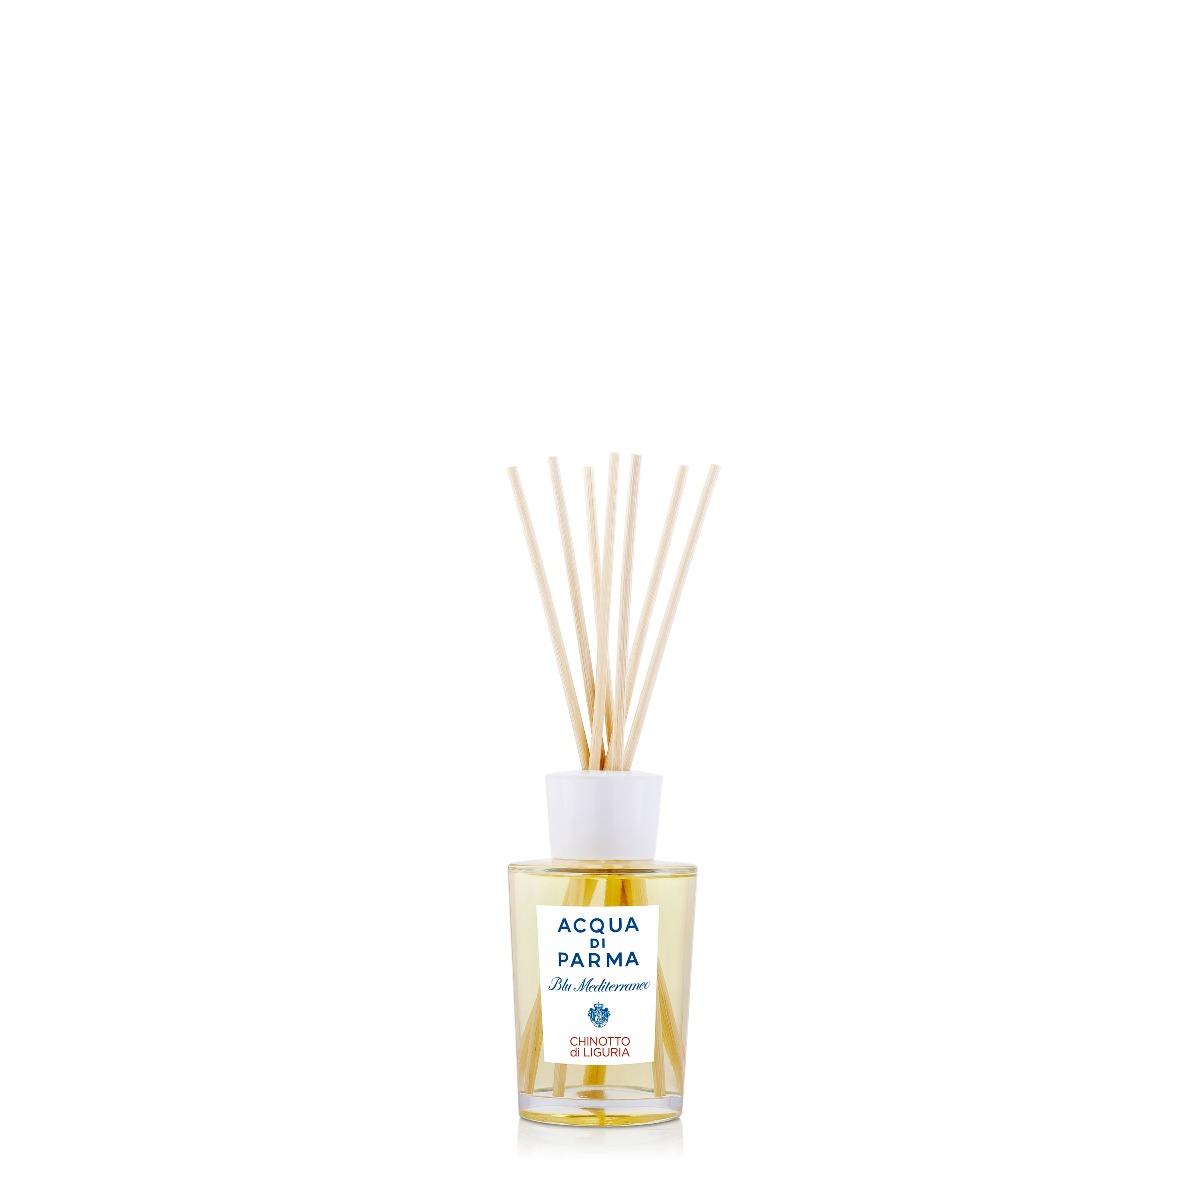 Dyfuzor zapachowy BM Chinotto di Liguria 180ml Miloo Home 62209